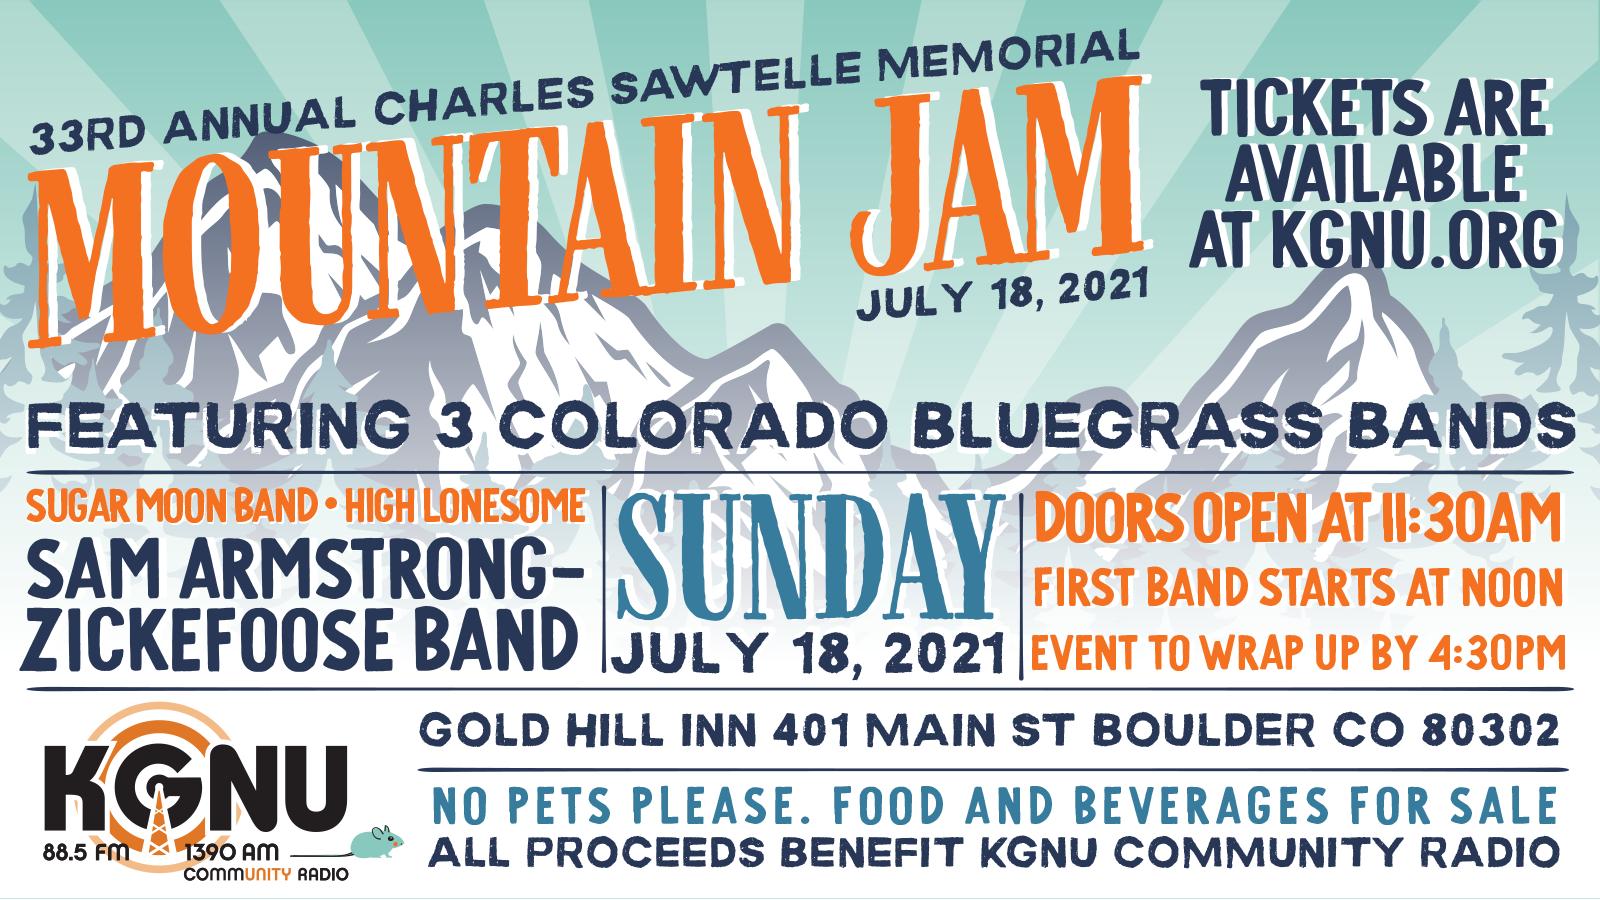 The Charles Sawtelle Memorial Mountain Jam 2021